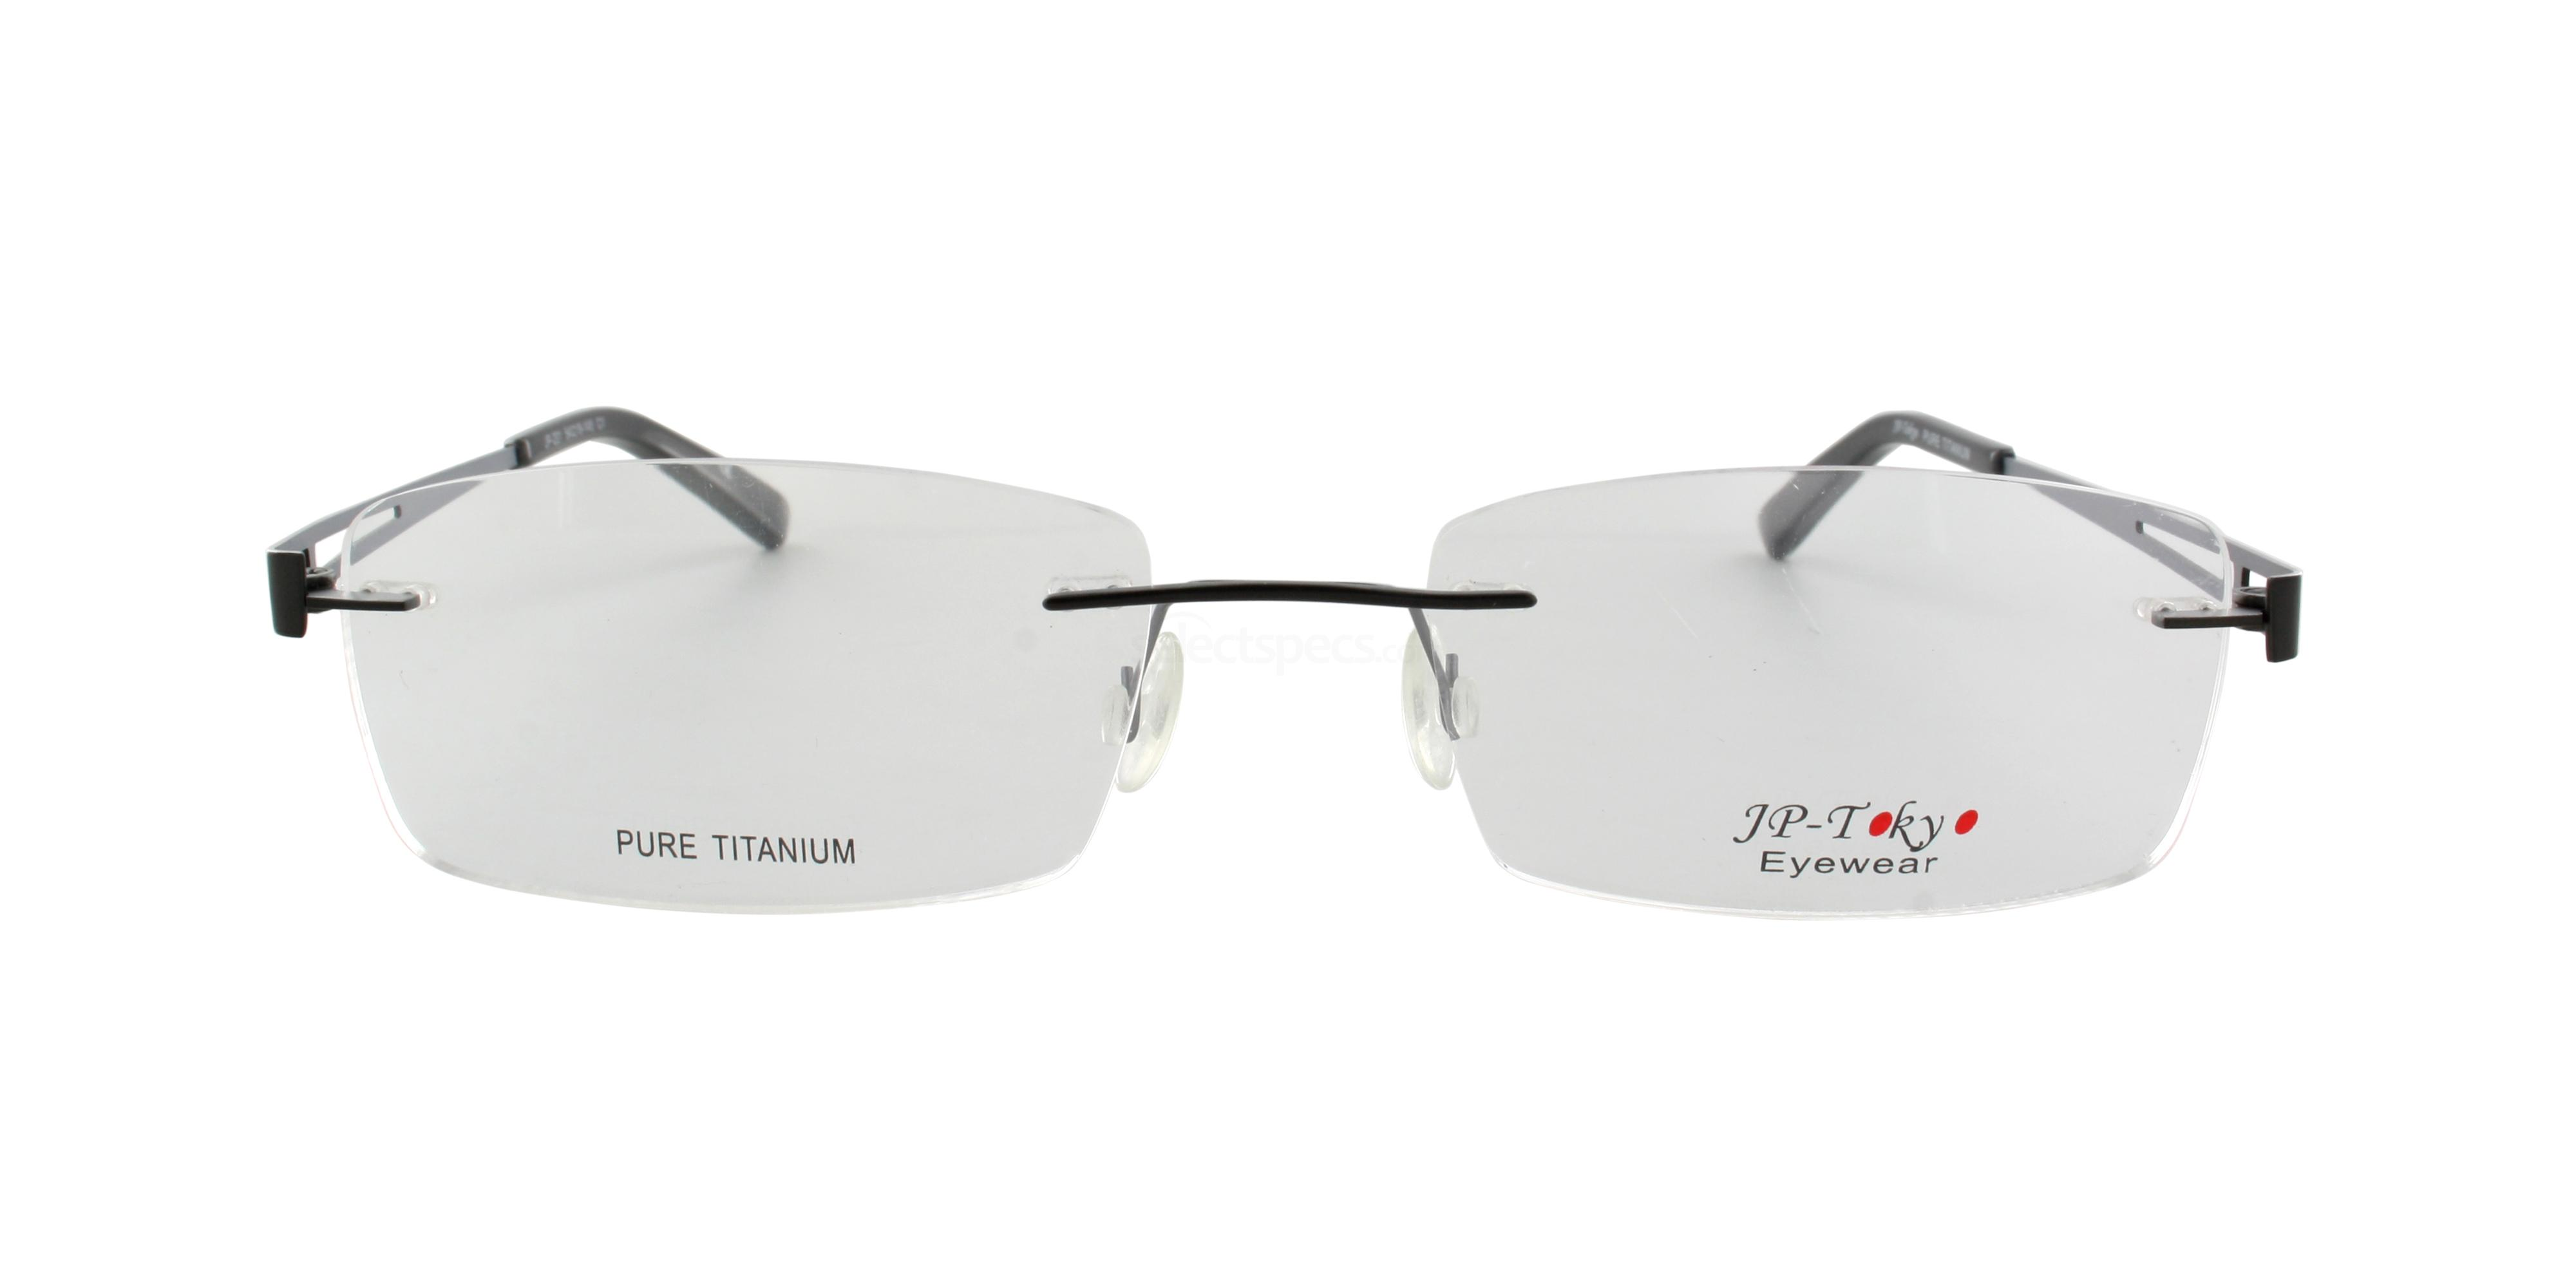 C1 JP201 Glasses, Vista